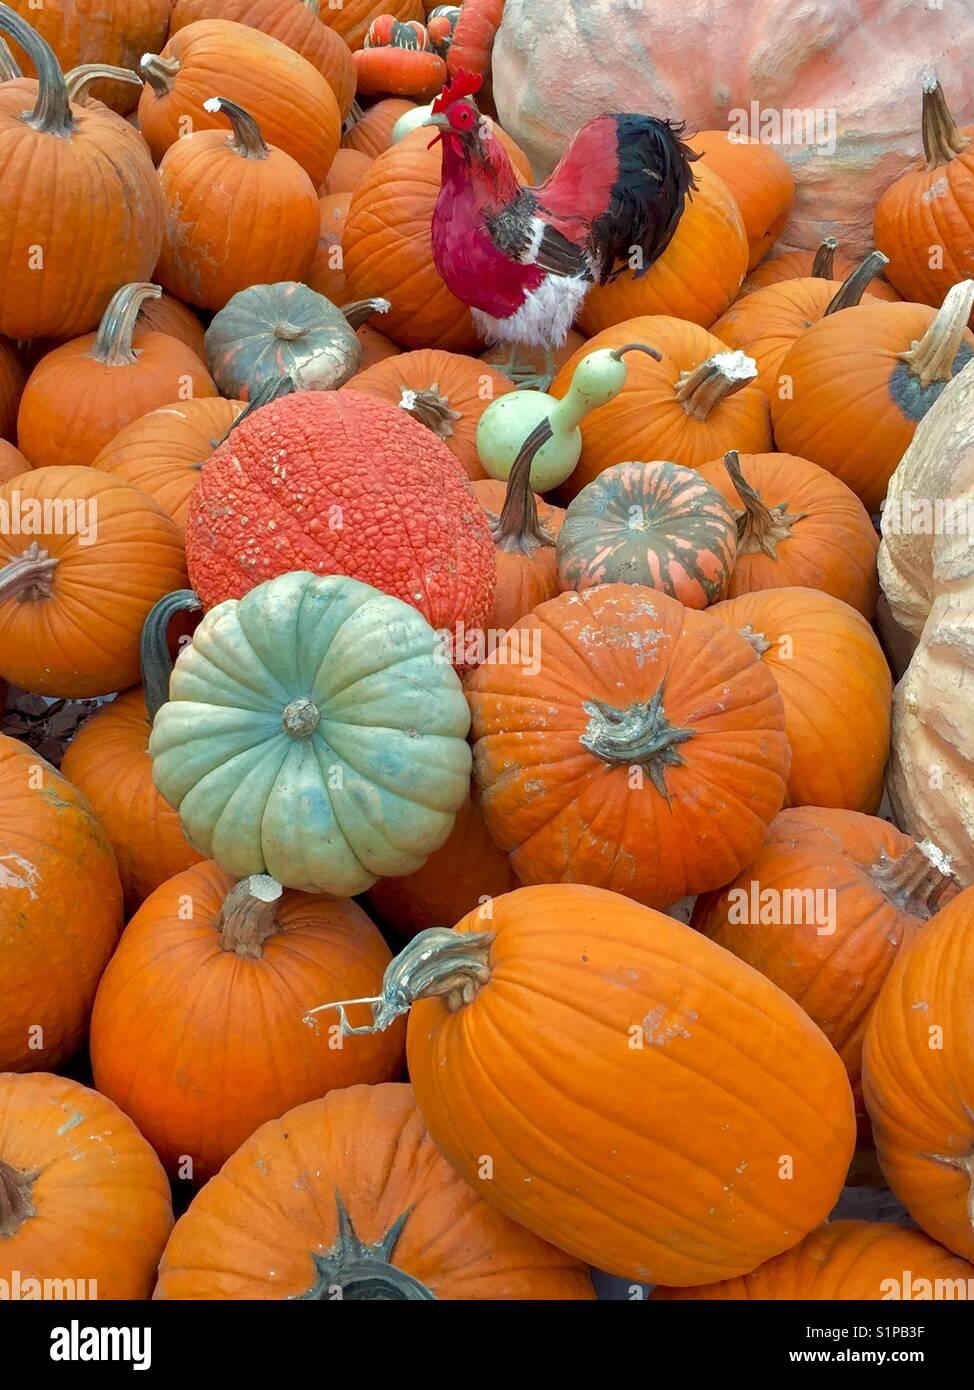 pumpkins - Stock Image